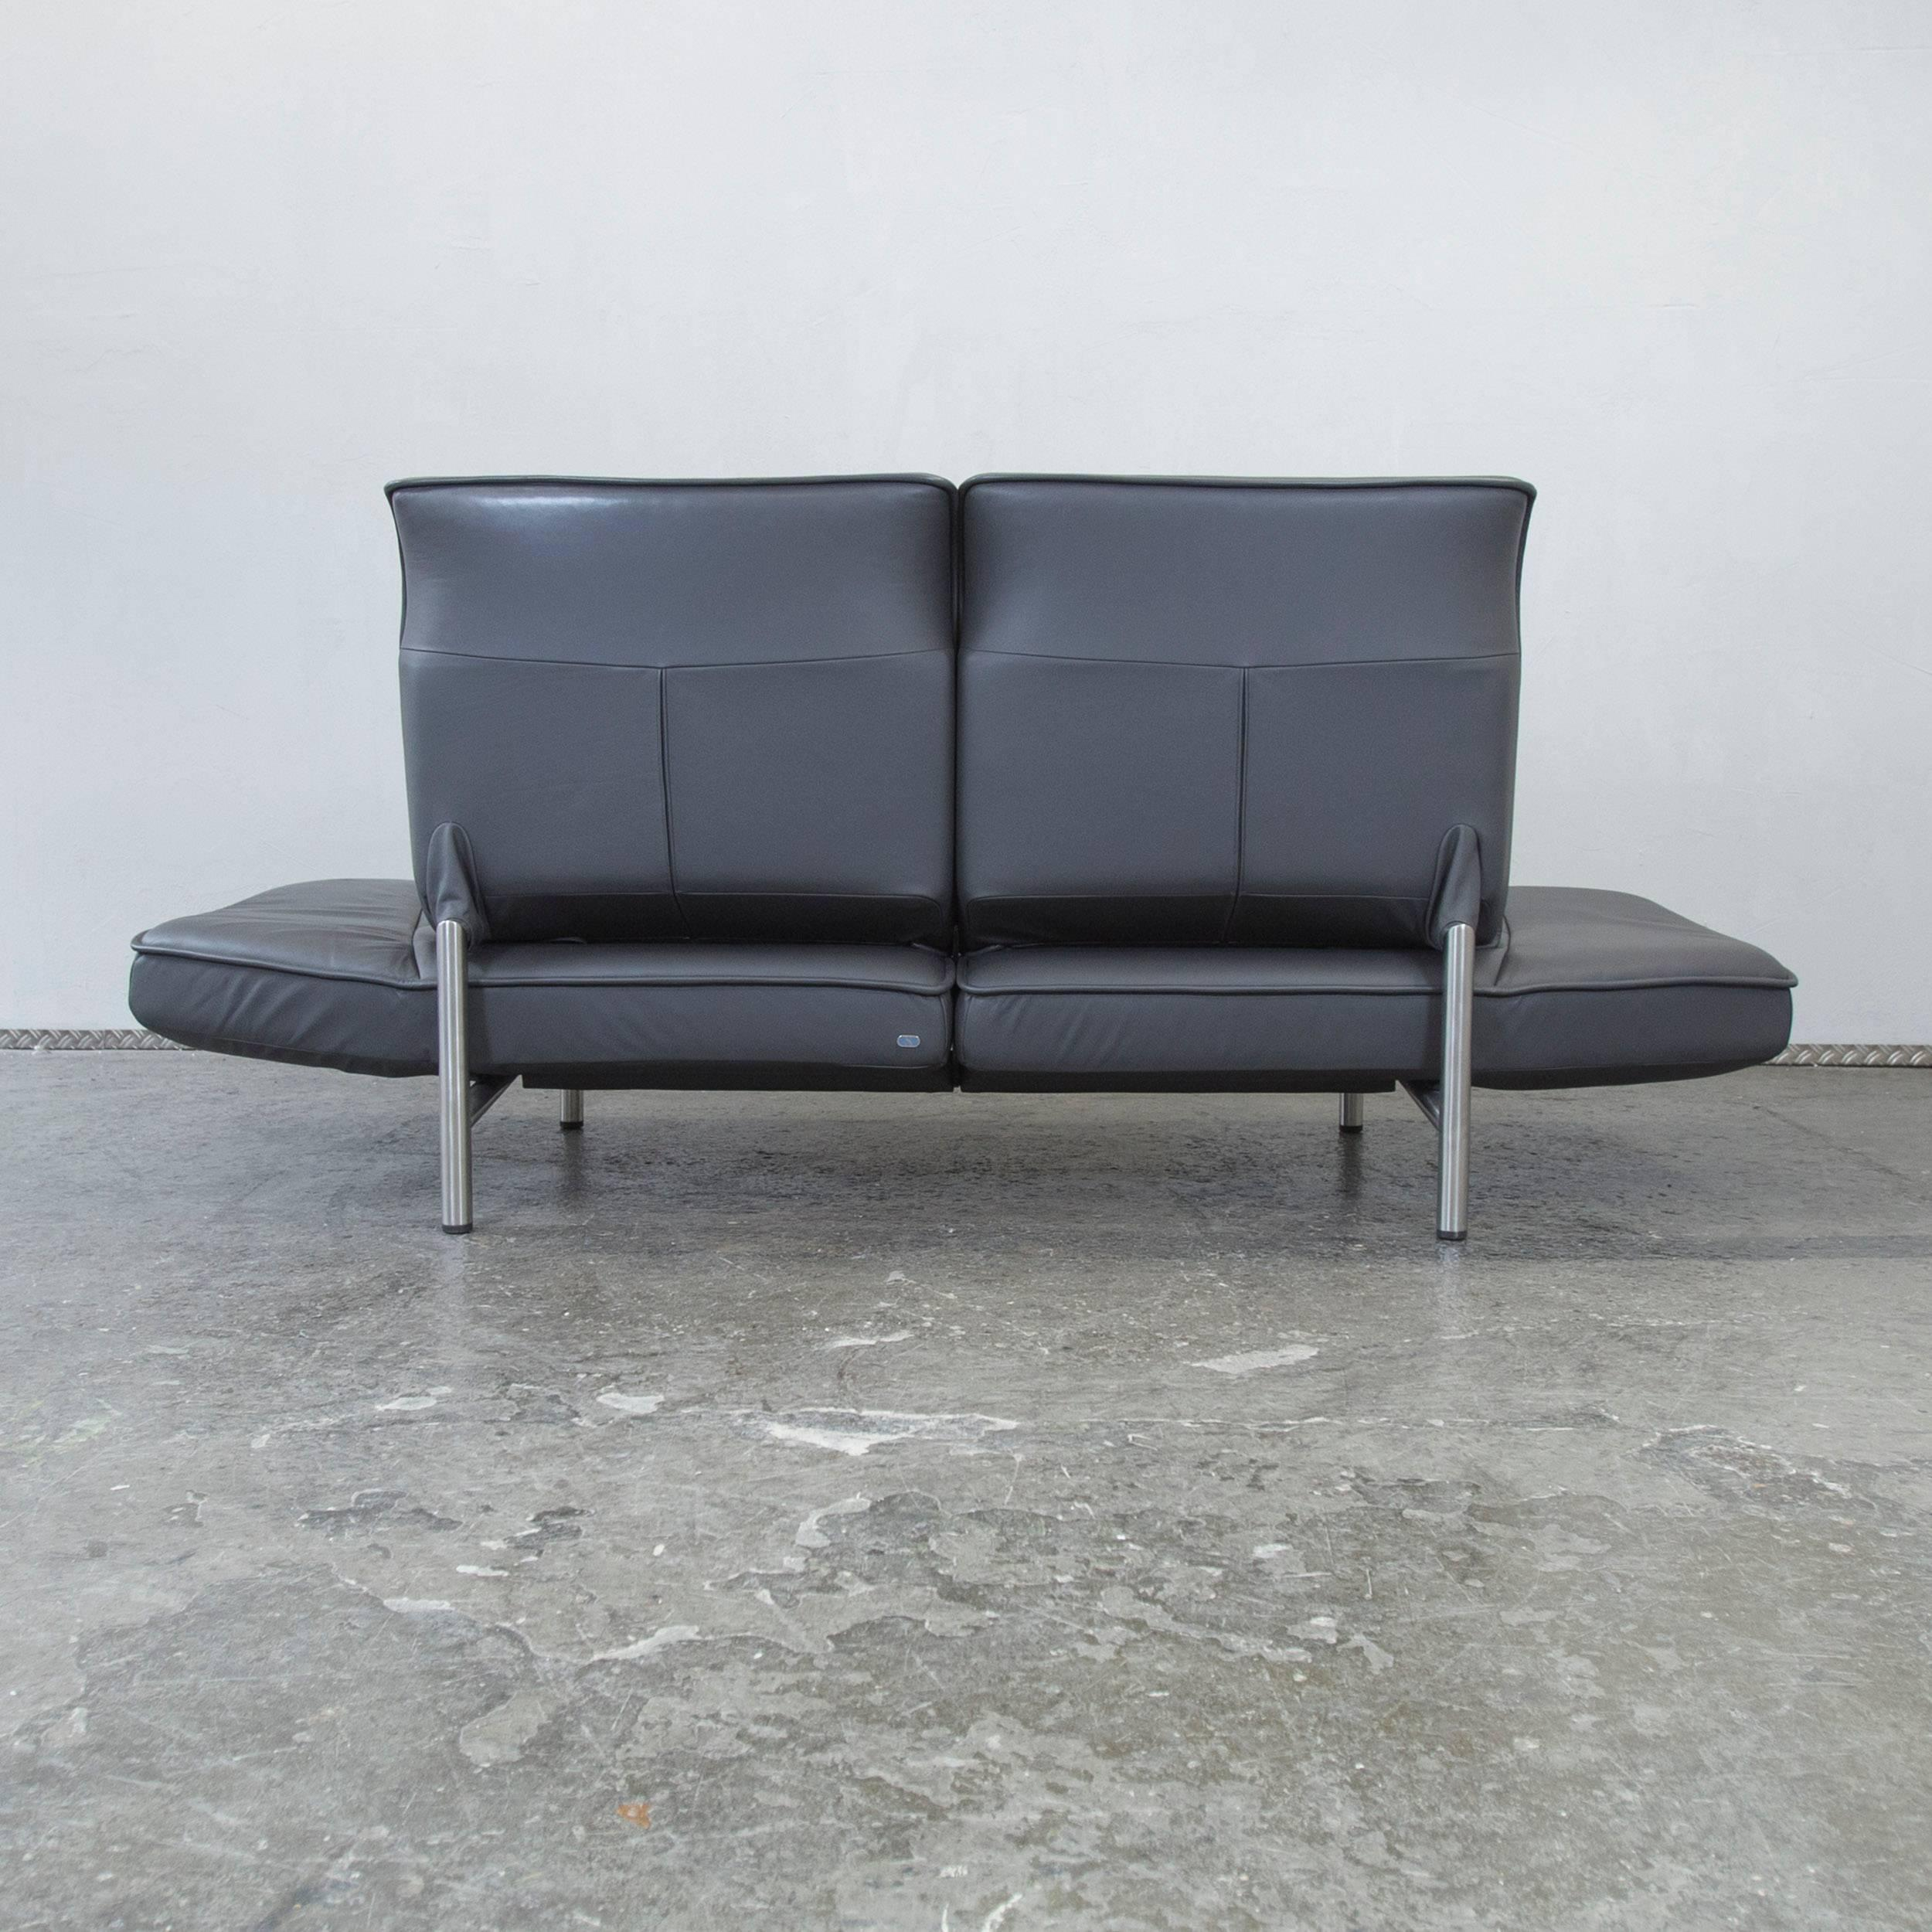 Sofa Modern Grau Simple Bigsofa Mit Hocker Cord Blau Grau